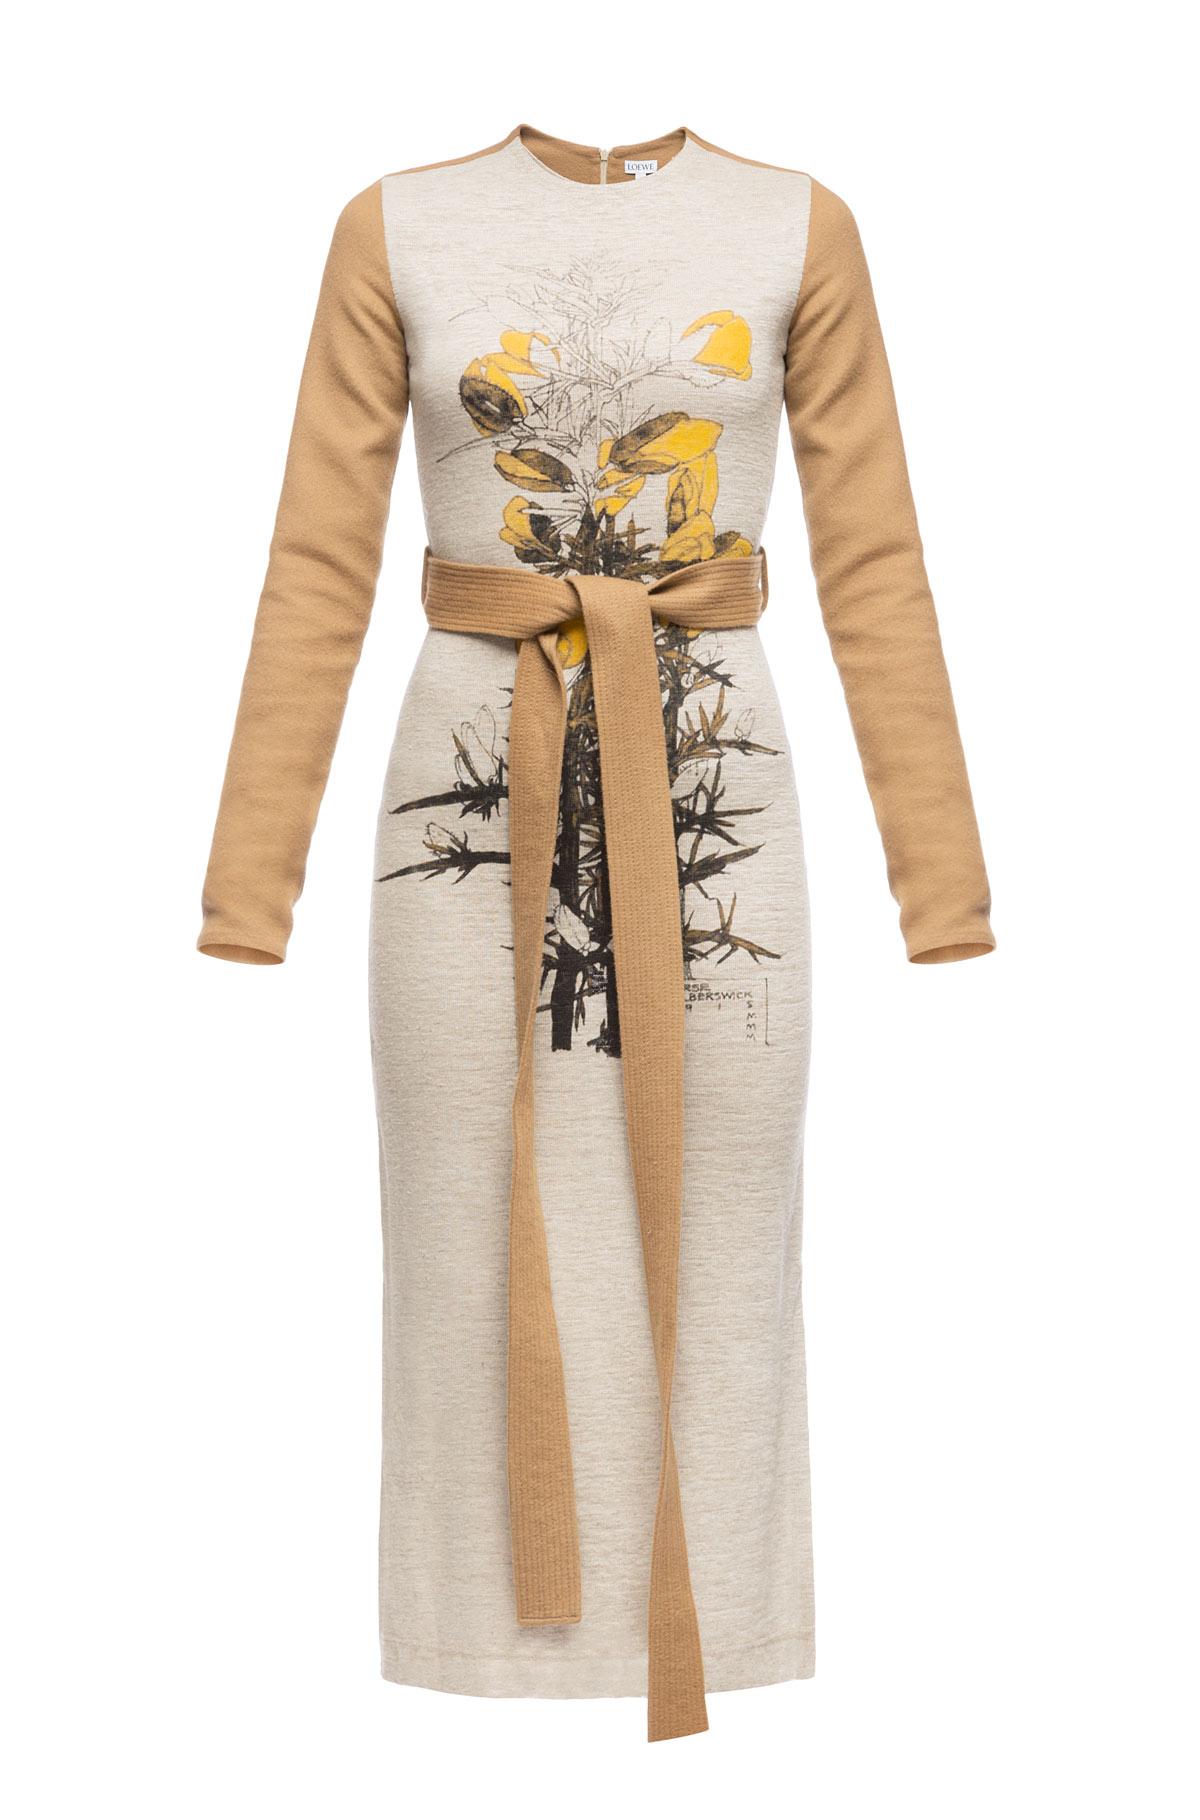 LOEWE T-Shirt Dress Botanical Beige/Camel front